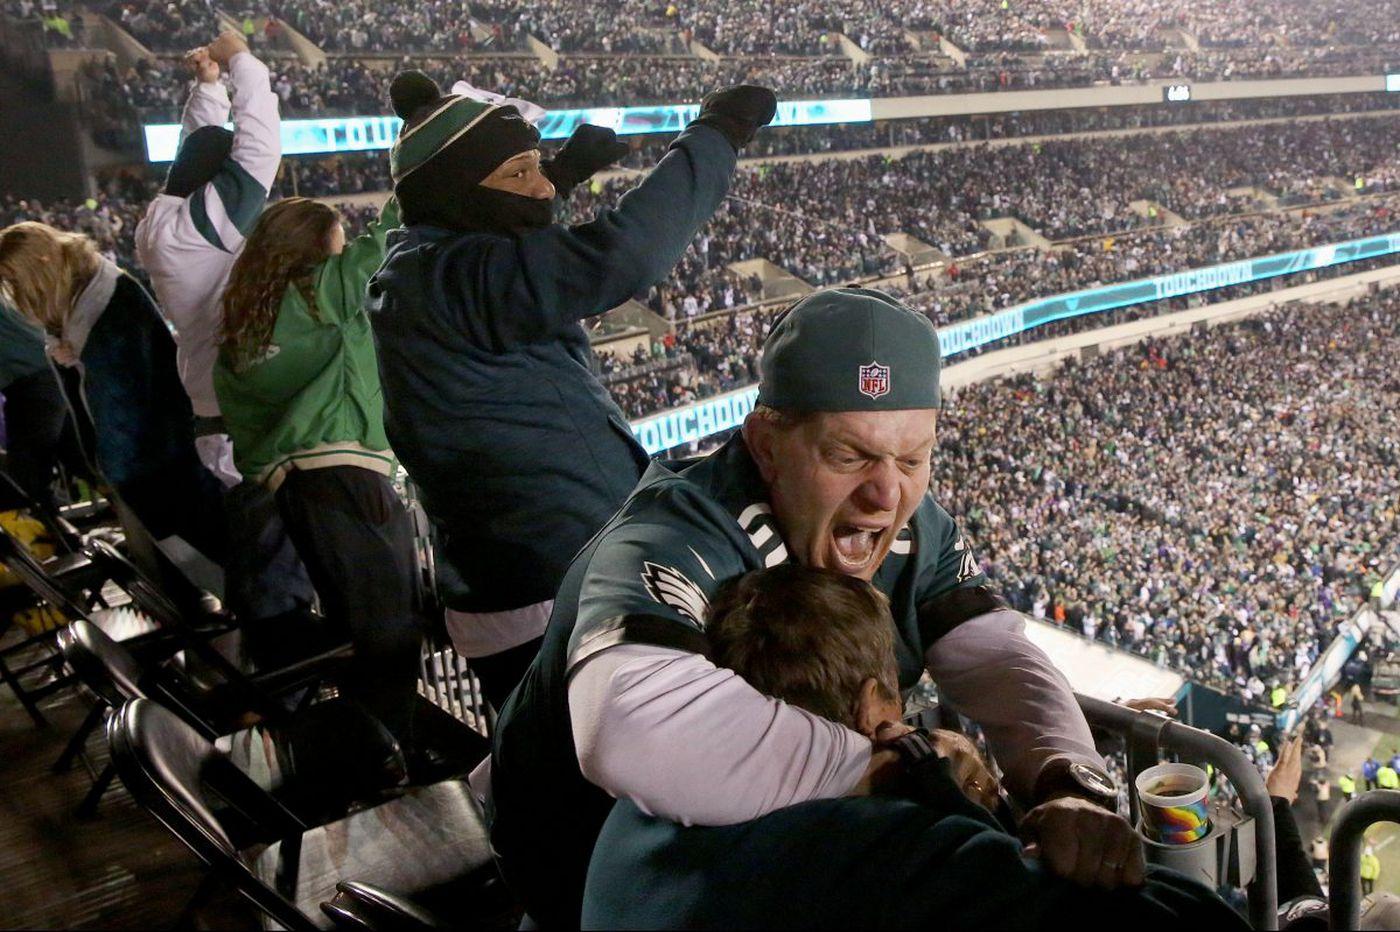 Eagles season tickets will cost more